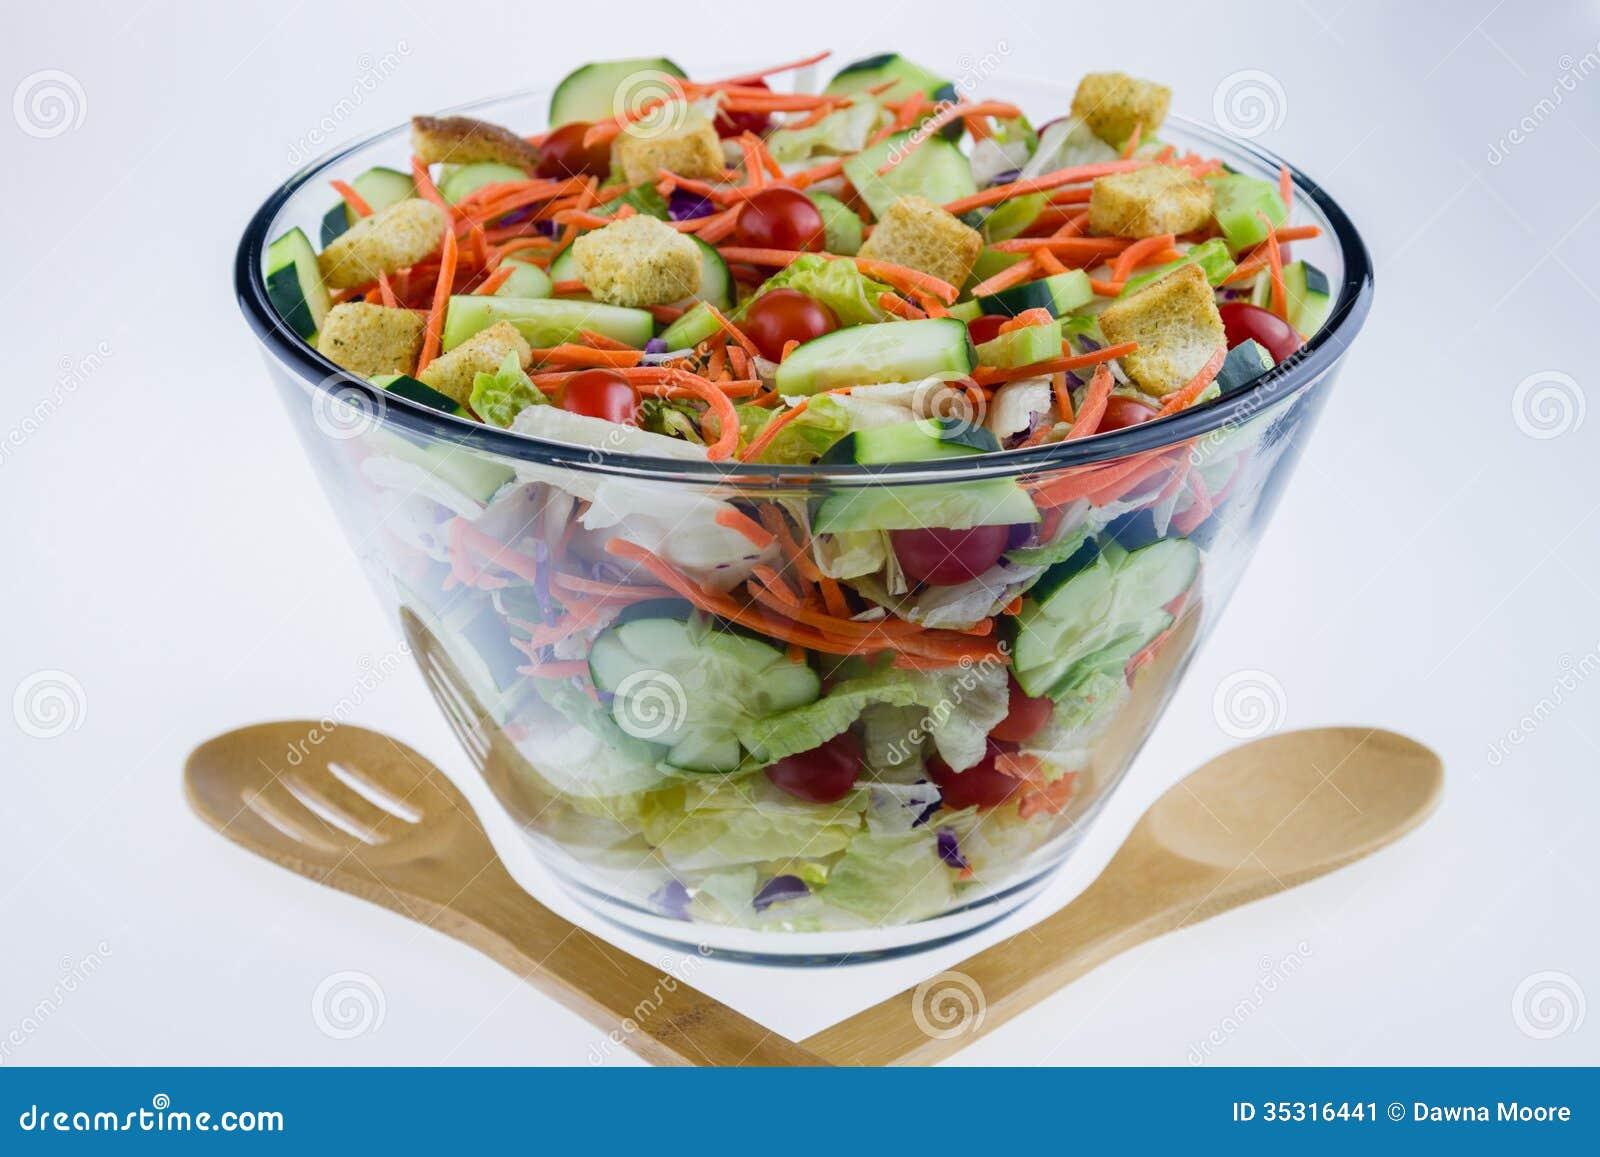 Close Up Of A Fresh Garden Salad Stock Image Image Of Leaf